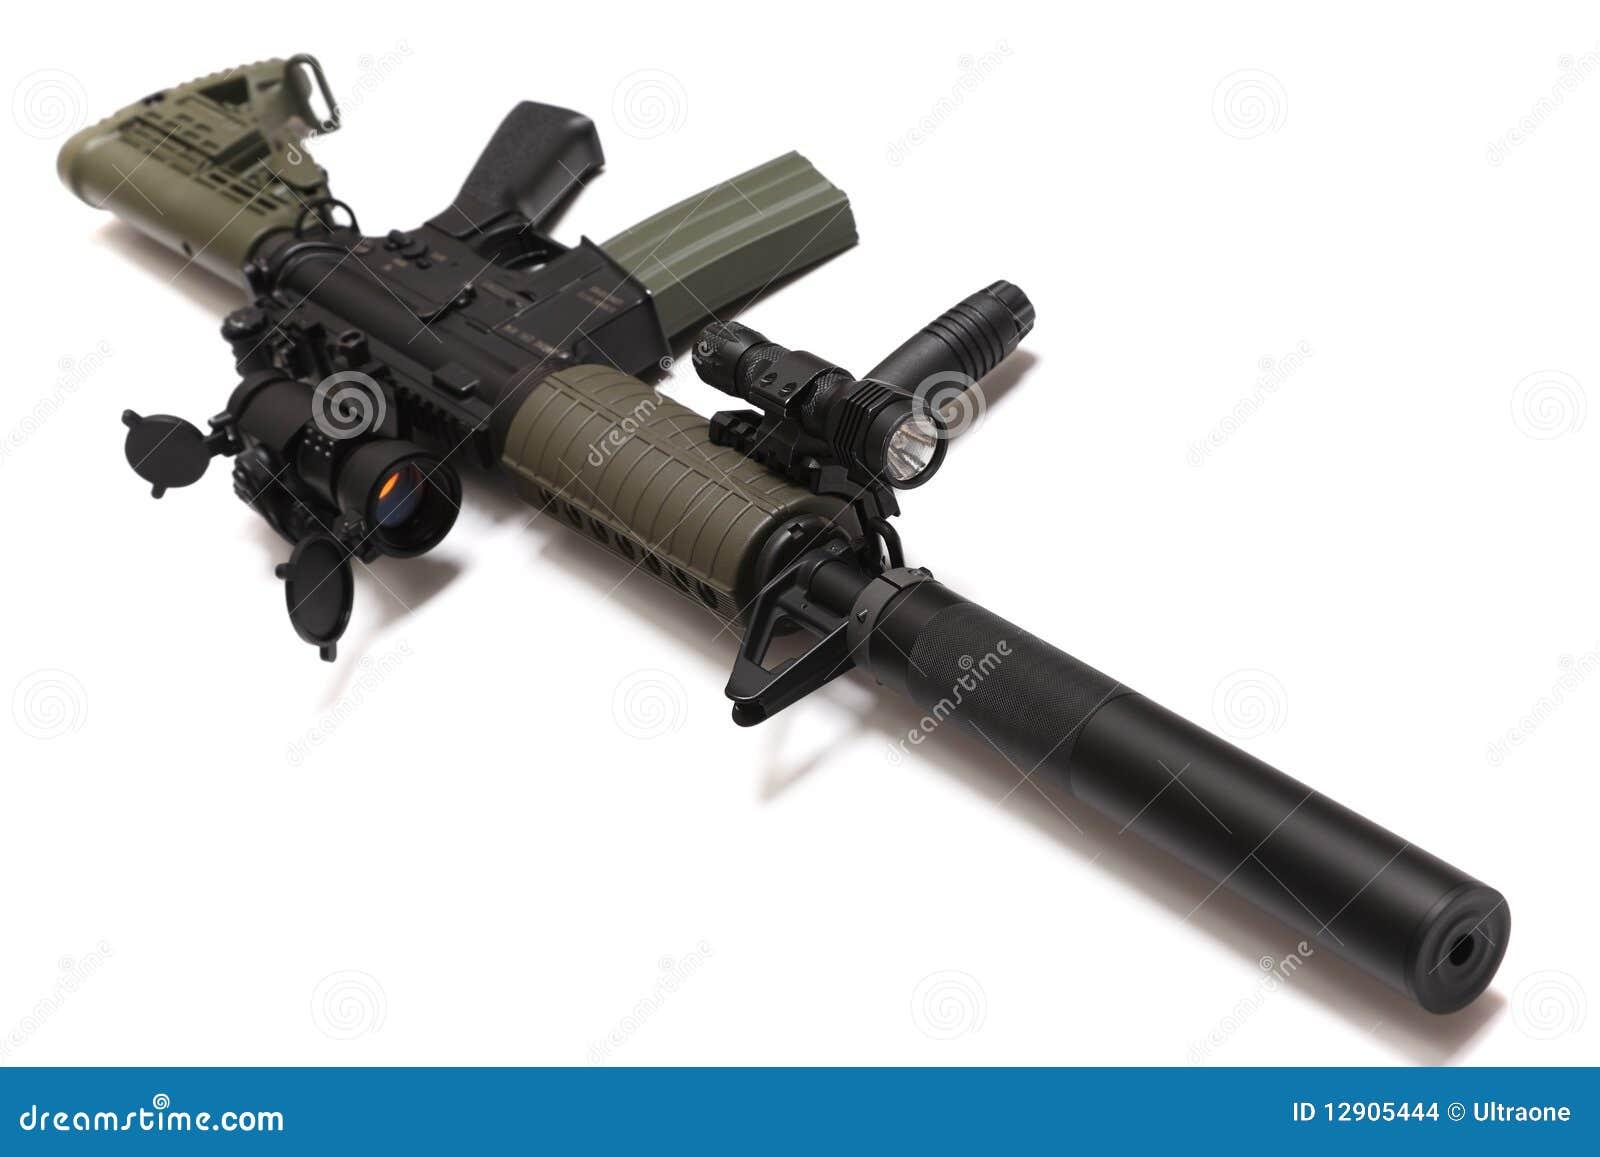 Fucile di assalto di abitudine di spec. Ops M4A1 degli Stati Uniti.